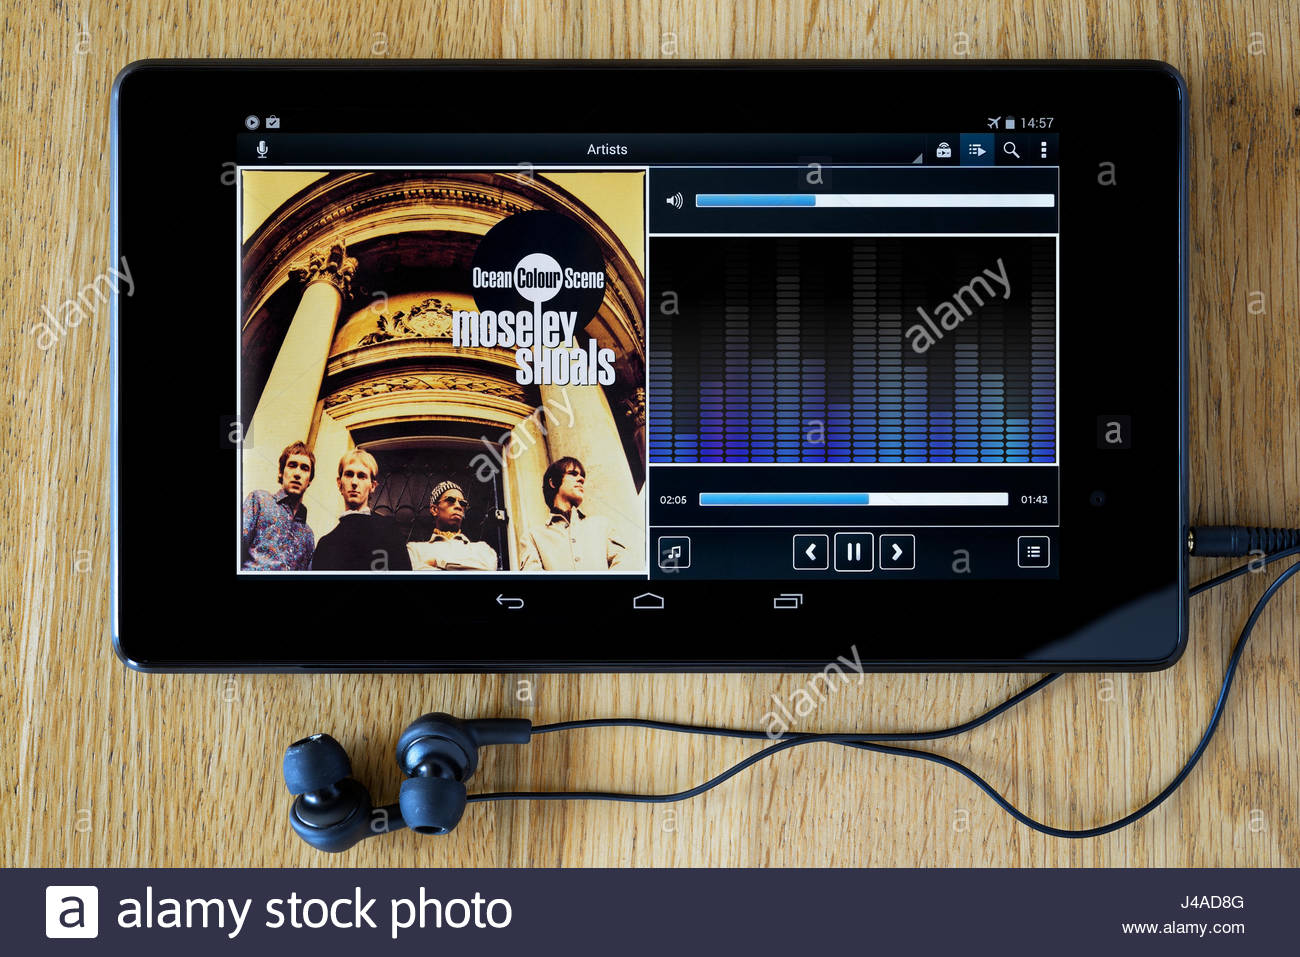 Ocean Colour Scene 1996 2nd album Moseley Shoals, MP3 album cover, Dorset, England Stock Photo